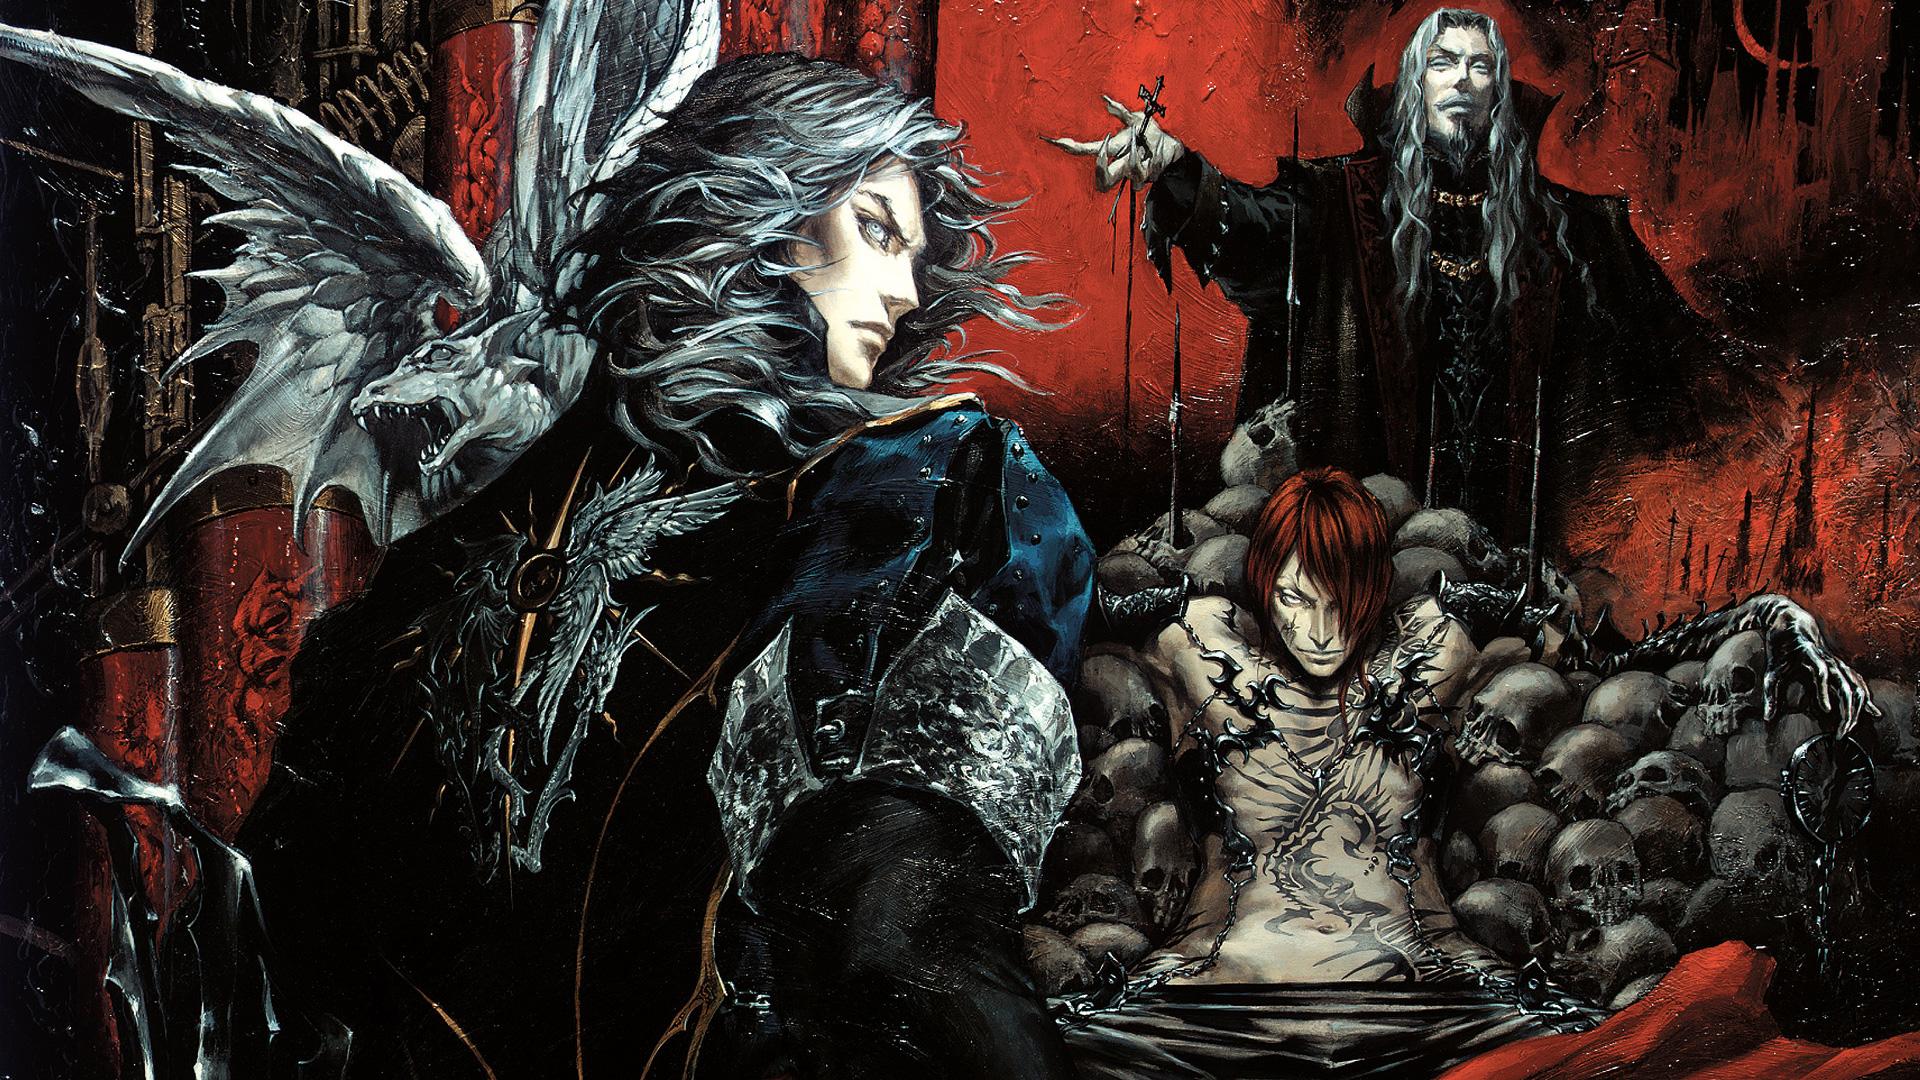 Castlevania: Curse of Darkness Wallpaper in 1920x1080